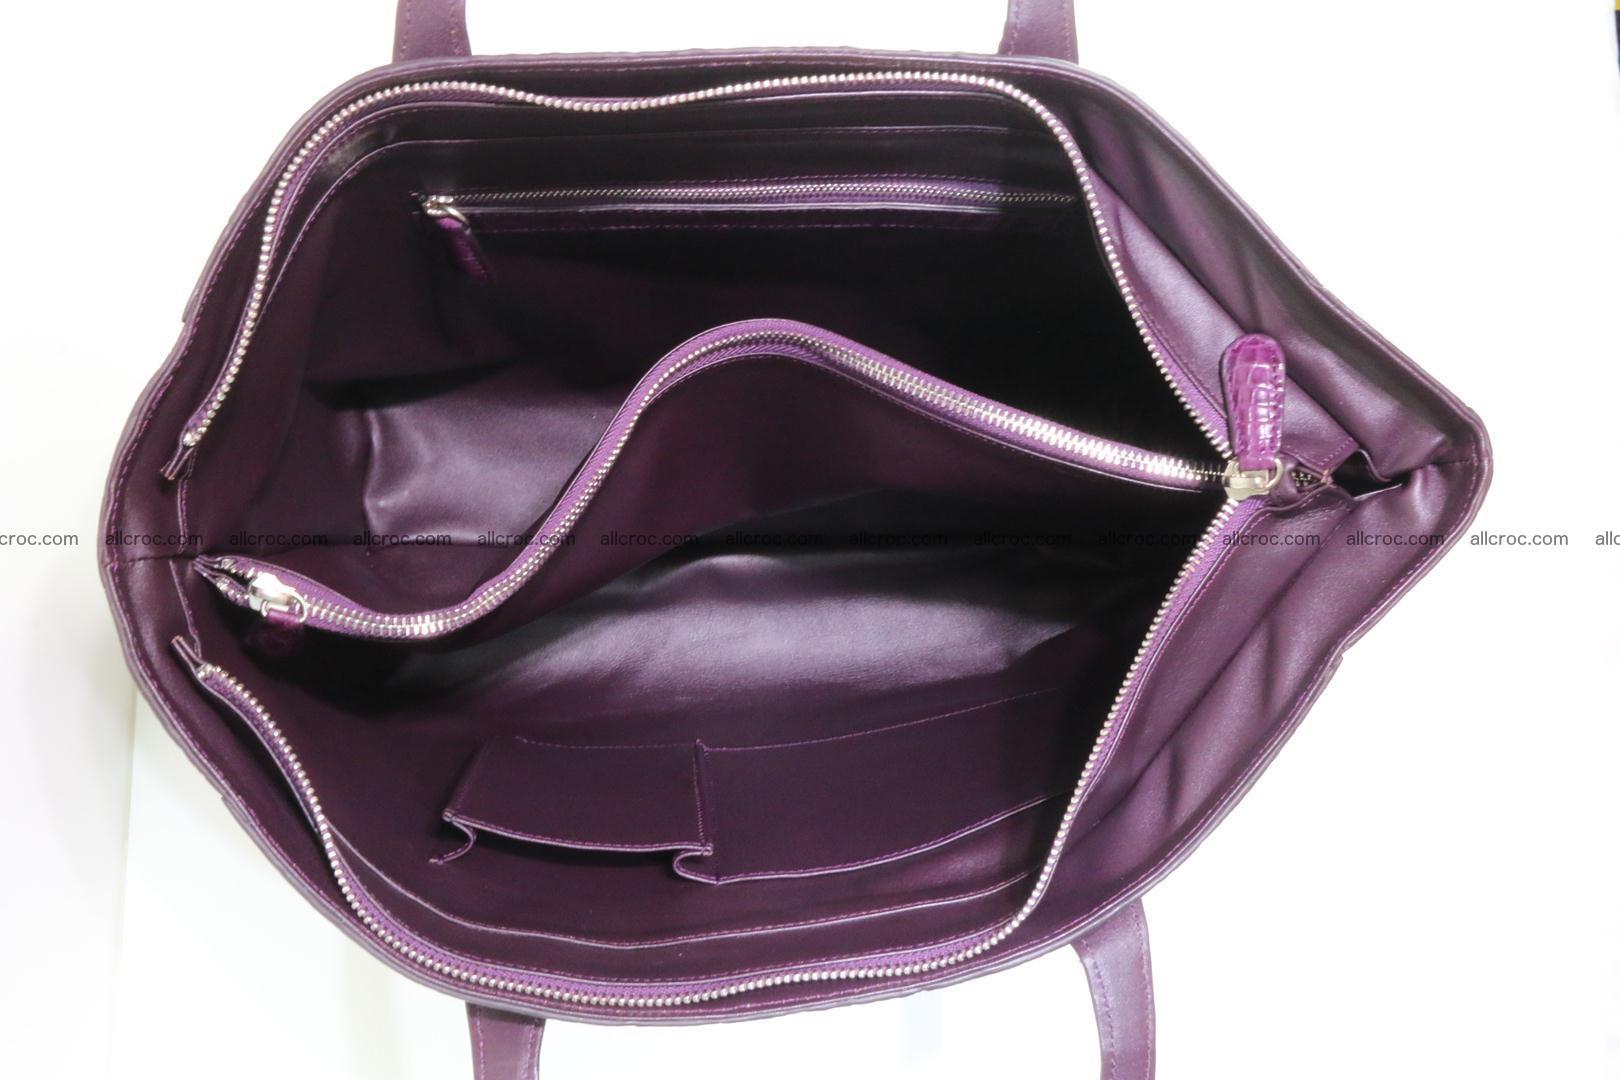 Genuine crocodile leather women's bag 061 Foto 13